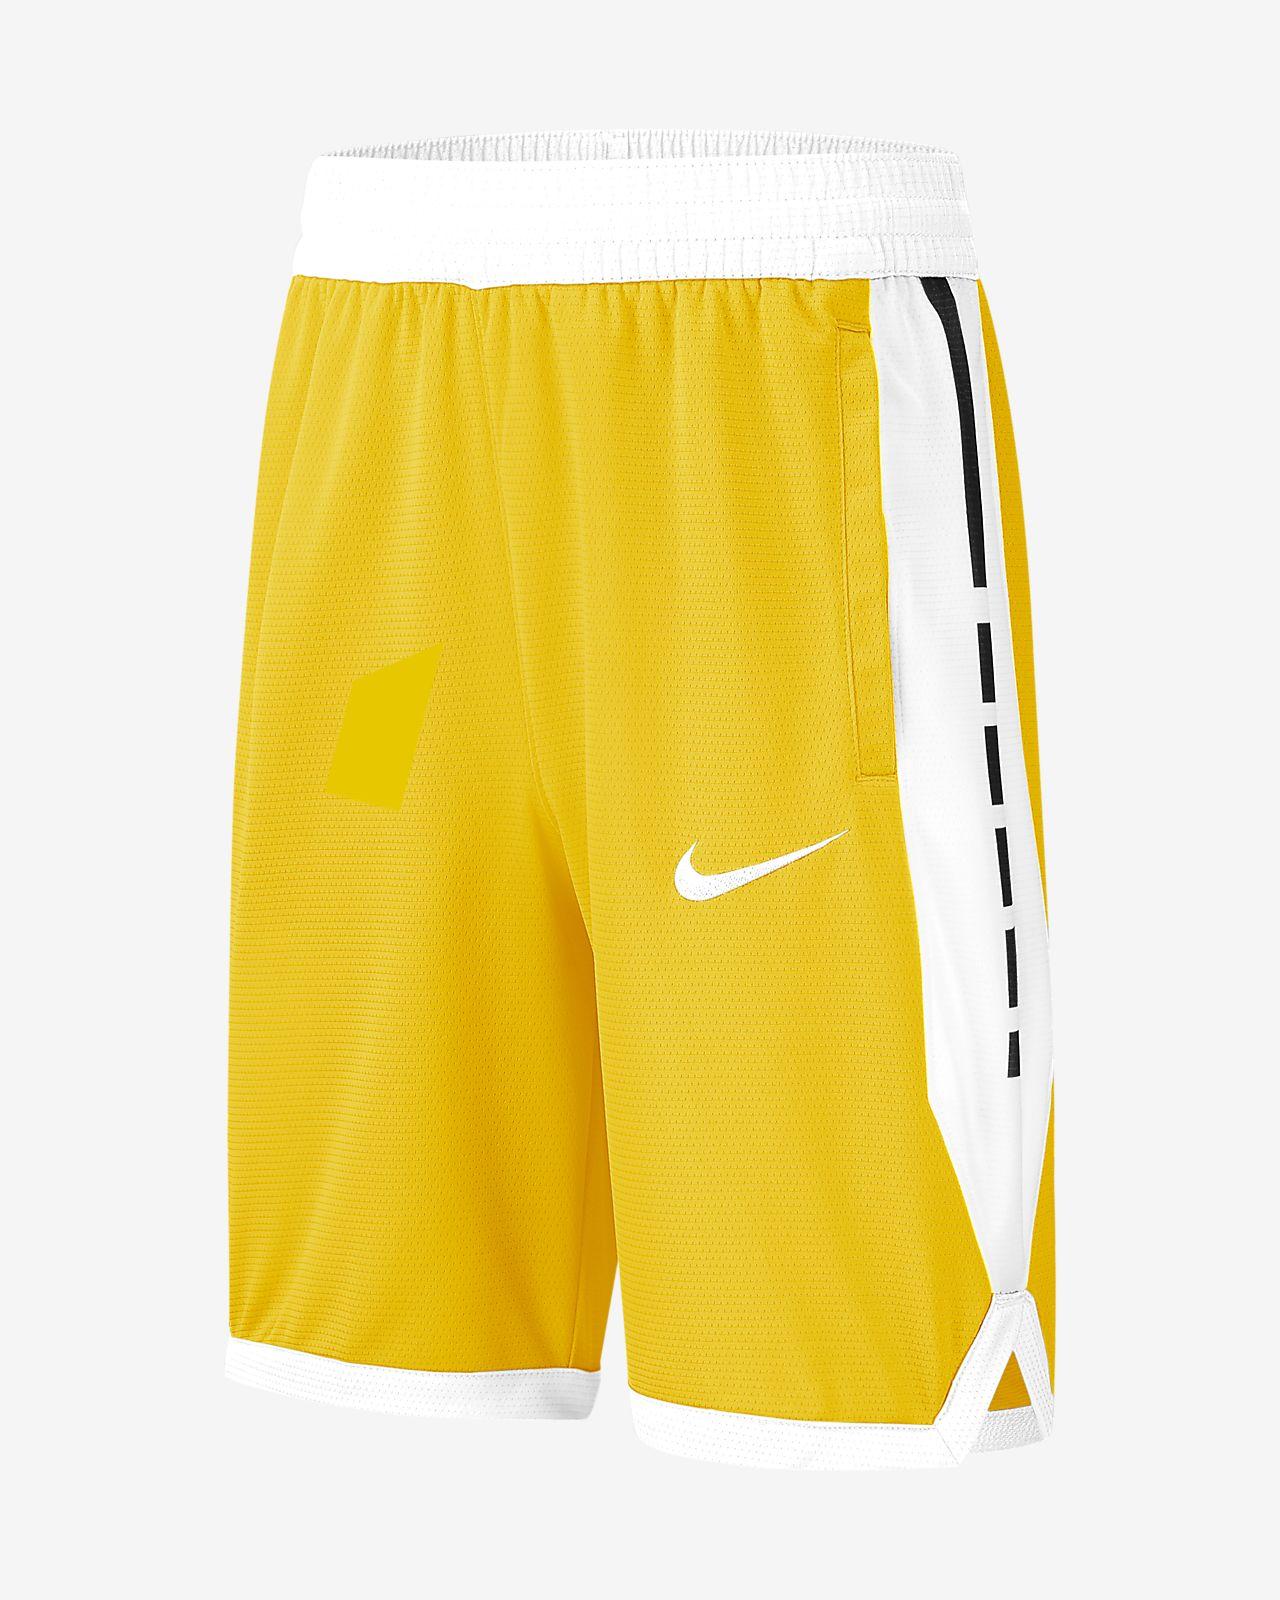 Nike Dri-FIT Elite Big Kids' (Boys') Basketball Shorts